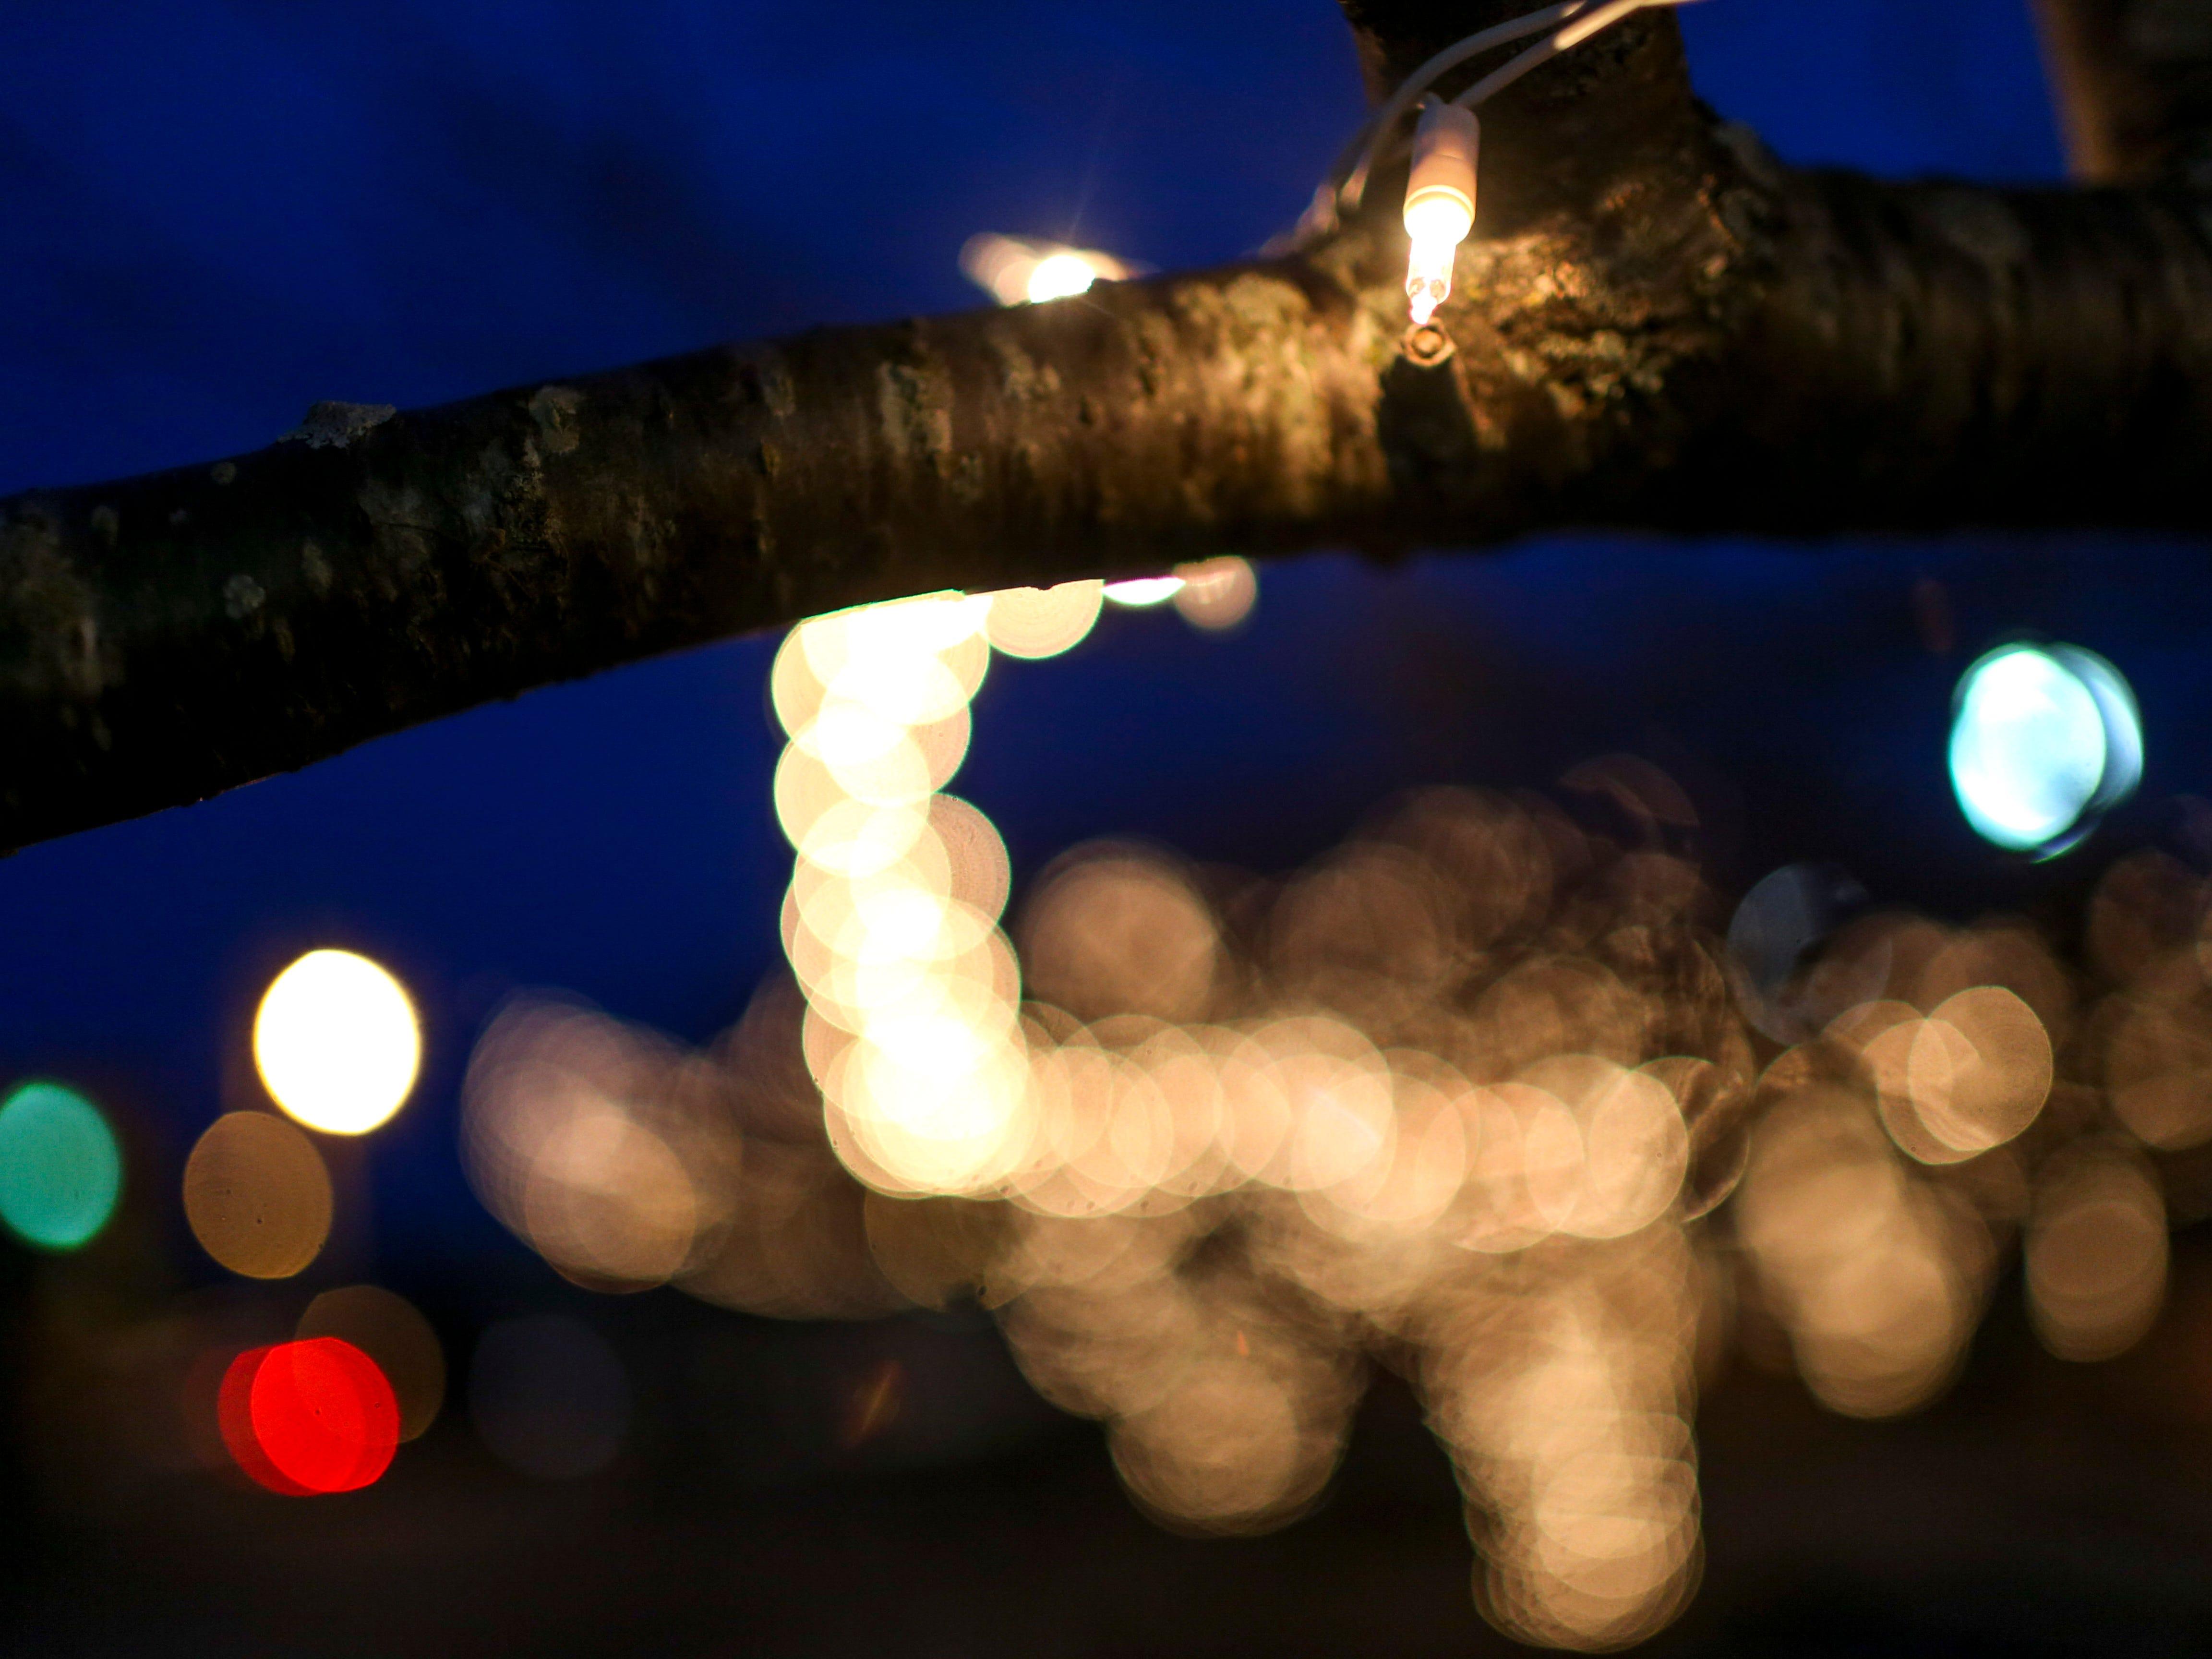 Festive holiday lights adorn the trees during the first public Chanukah Menorah Lighting at Anderson Park in Jackson, Tenn., on Thursday, Dec. 6, 2018.